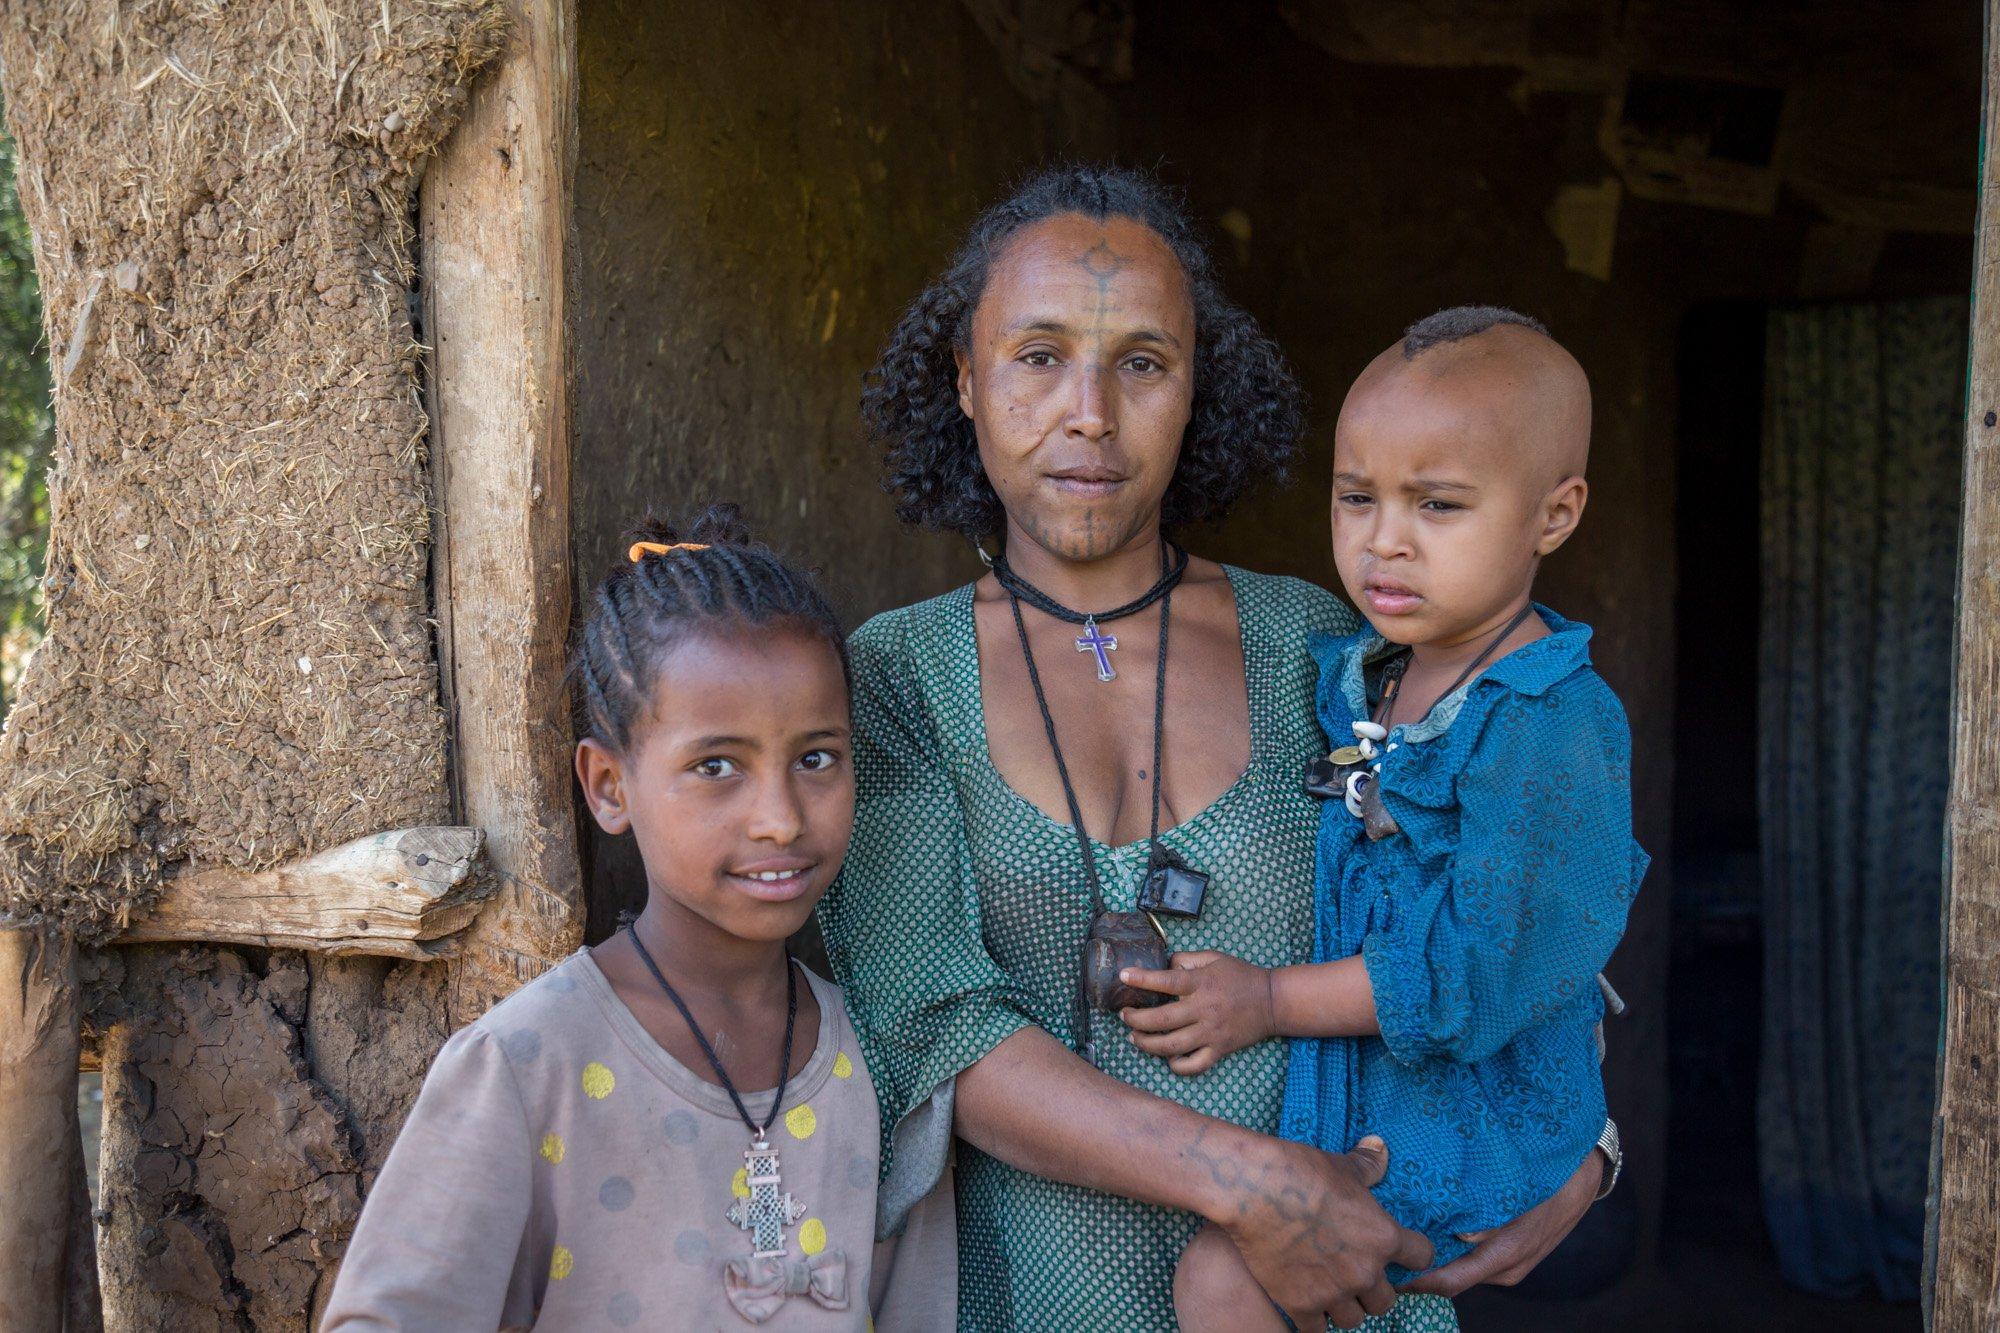 Woman from Amhara, Ethiopia